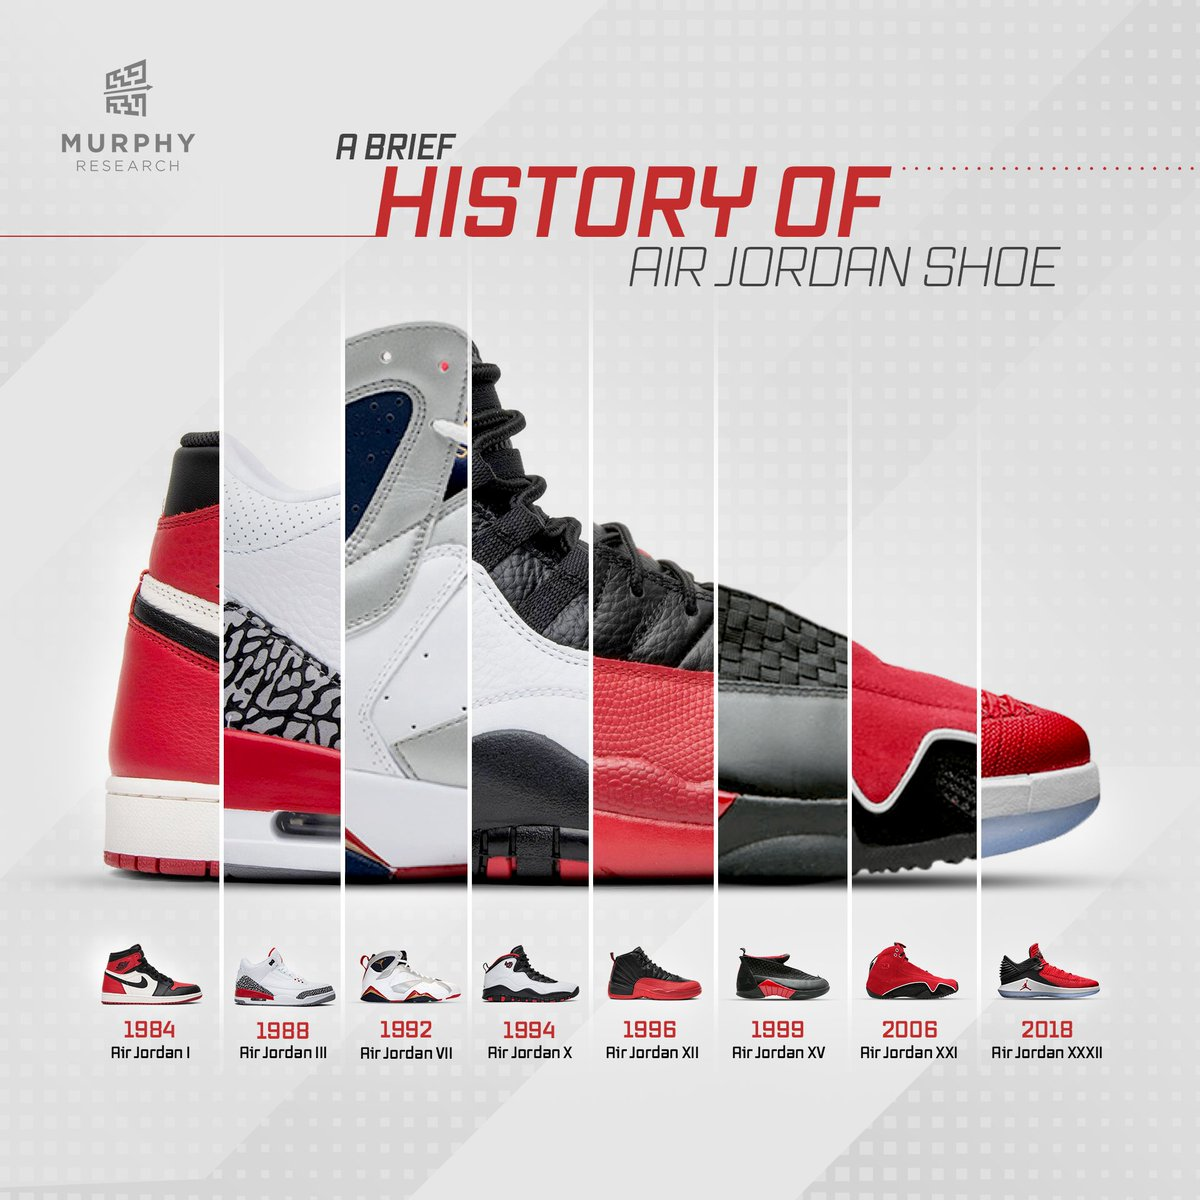 d31fdd0368b3  airjordan  sneakers  history  tinkerhatfield  nike   basketballpic.twitter.com FjLNwZTWld